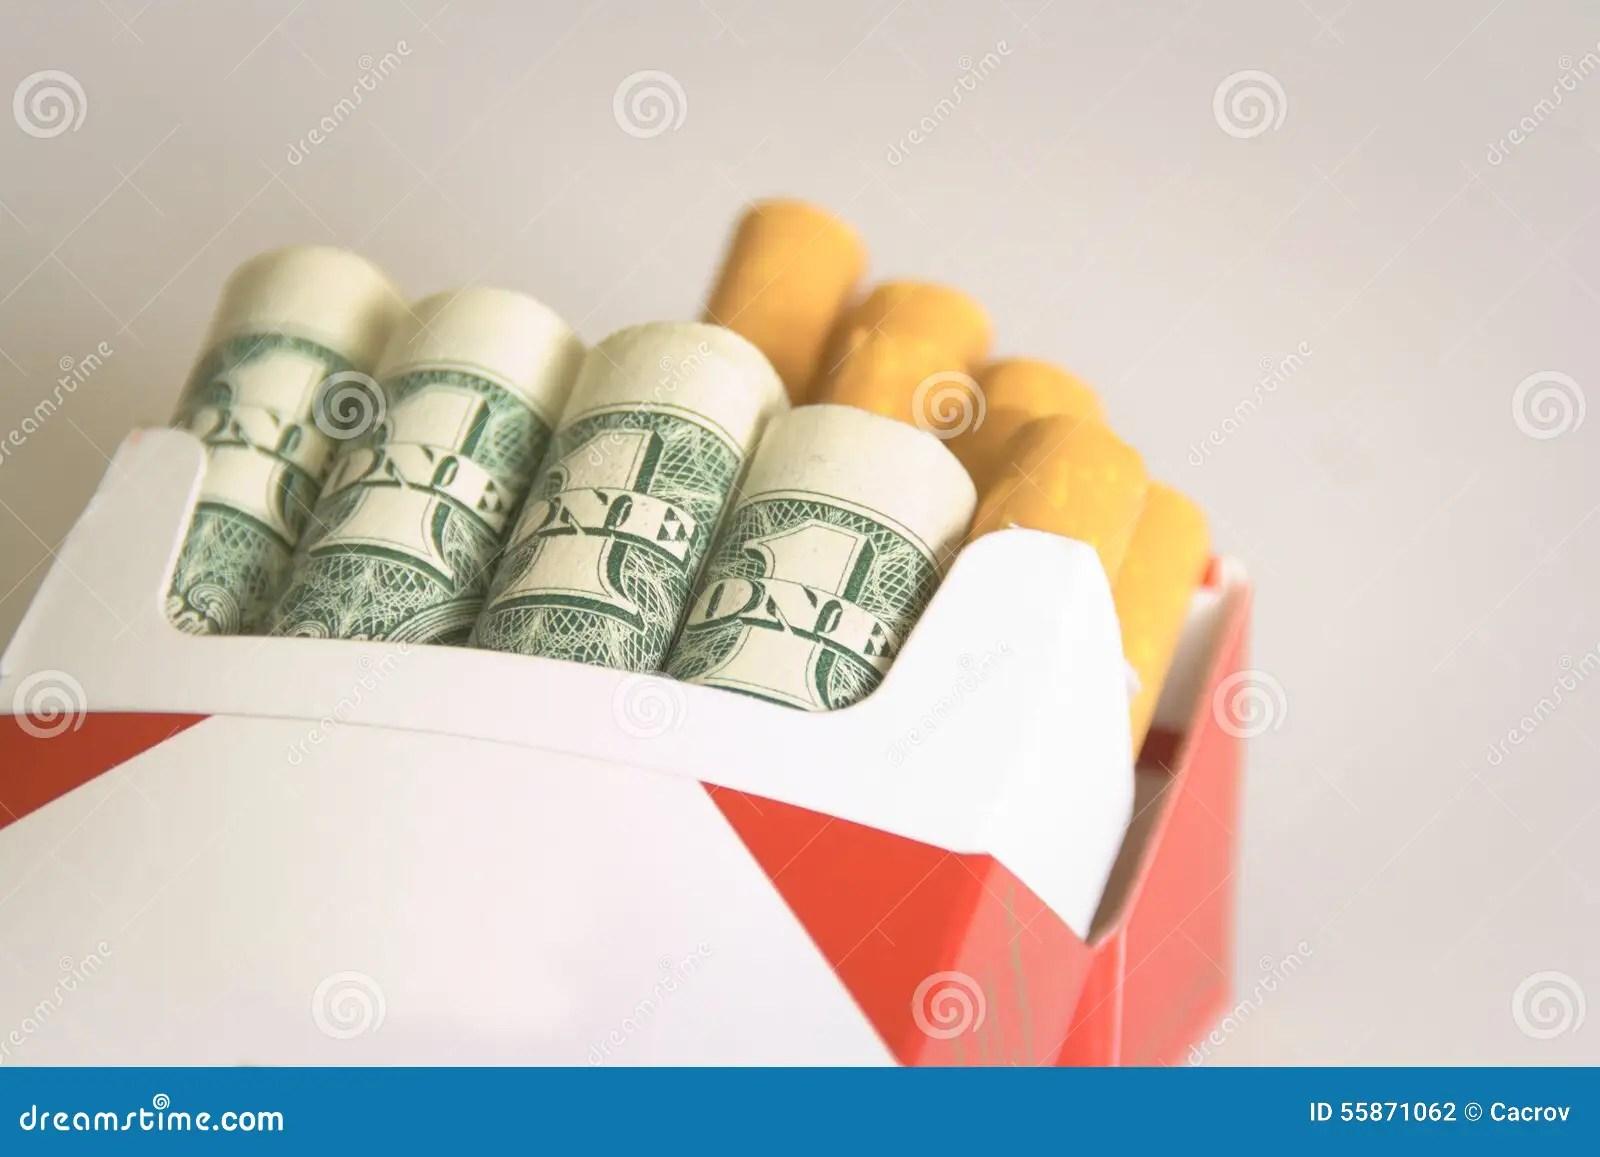 Smoking Costs Money Stock Photo Image Of Quit Bill